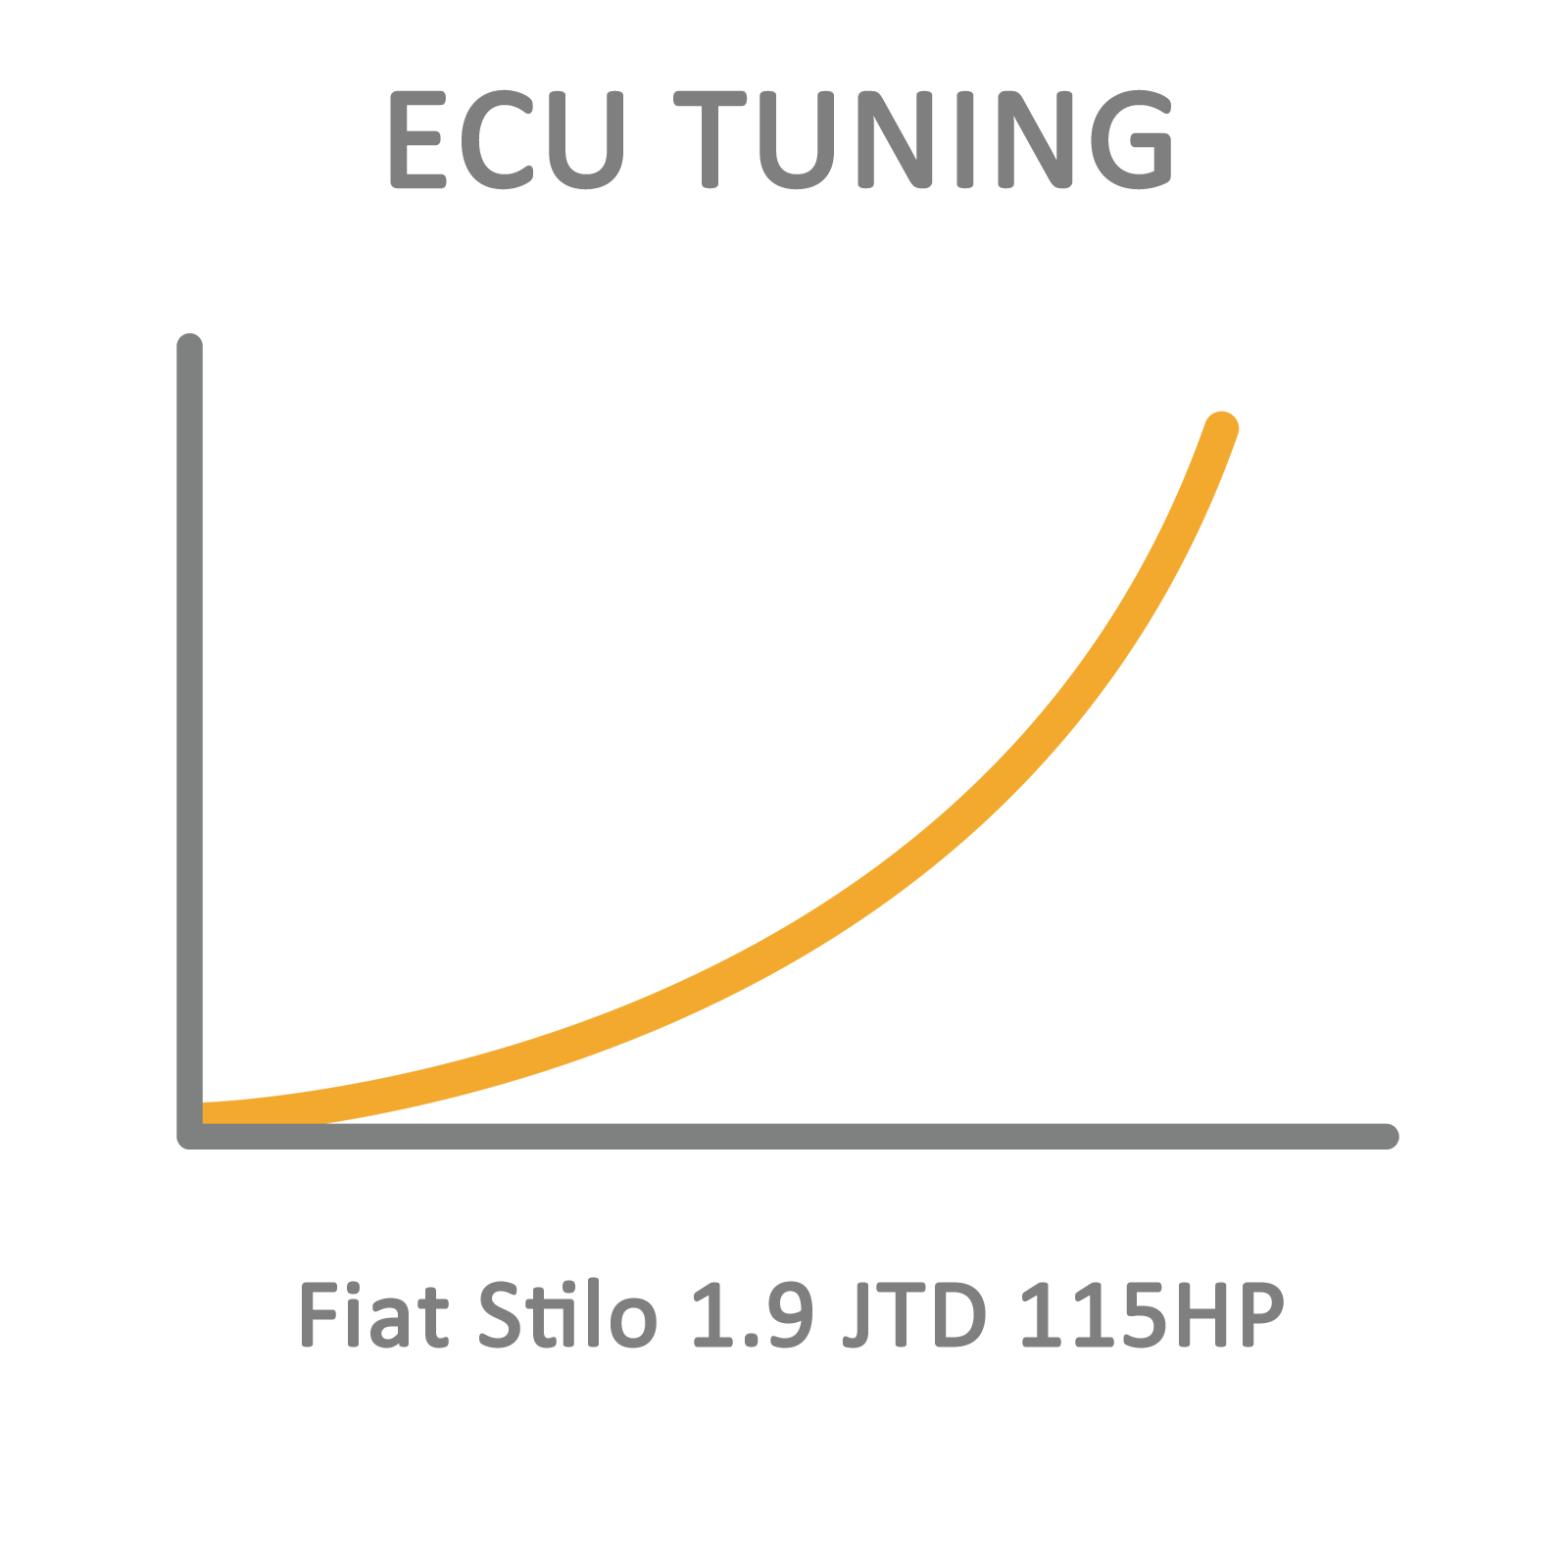 Fiat Stilo 1.9 JTD 115HP ECU Tuning Remapping Programming